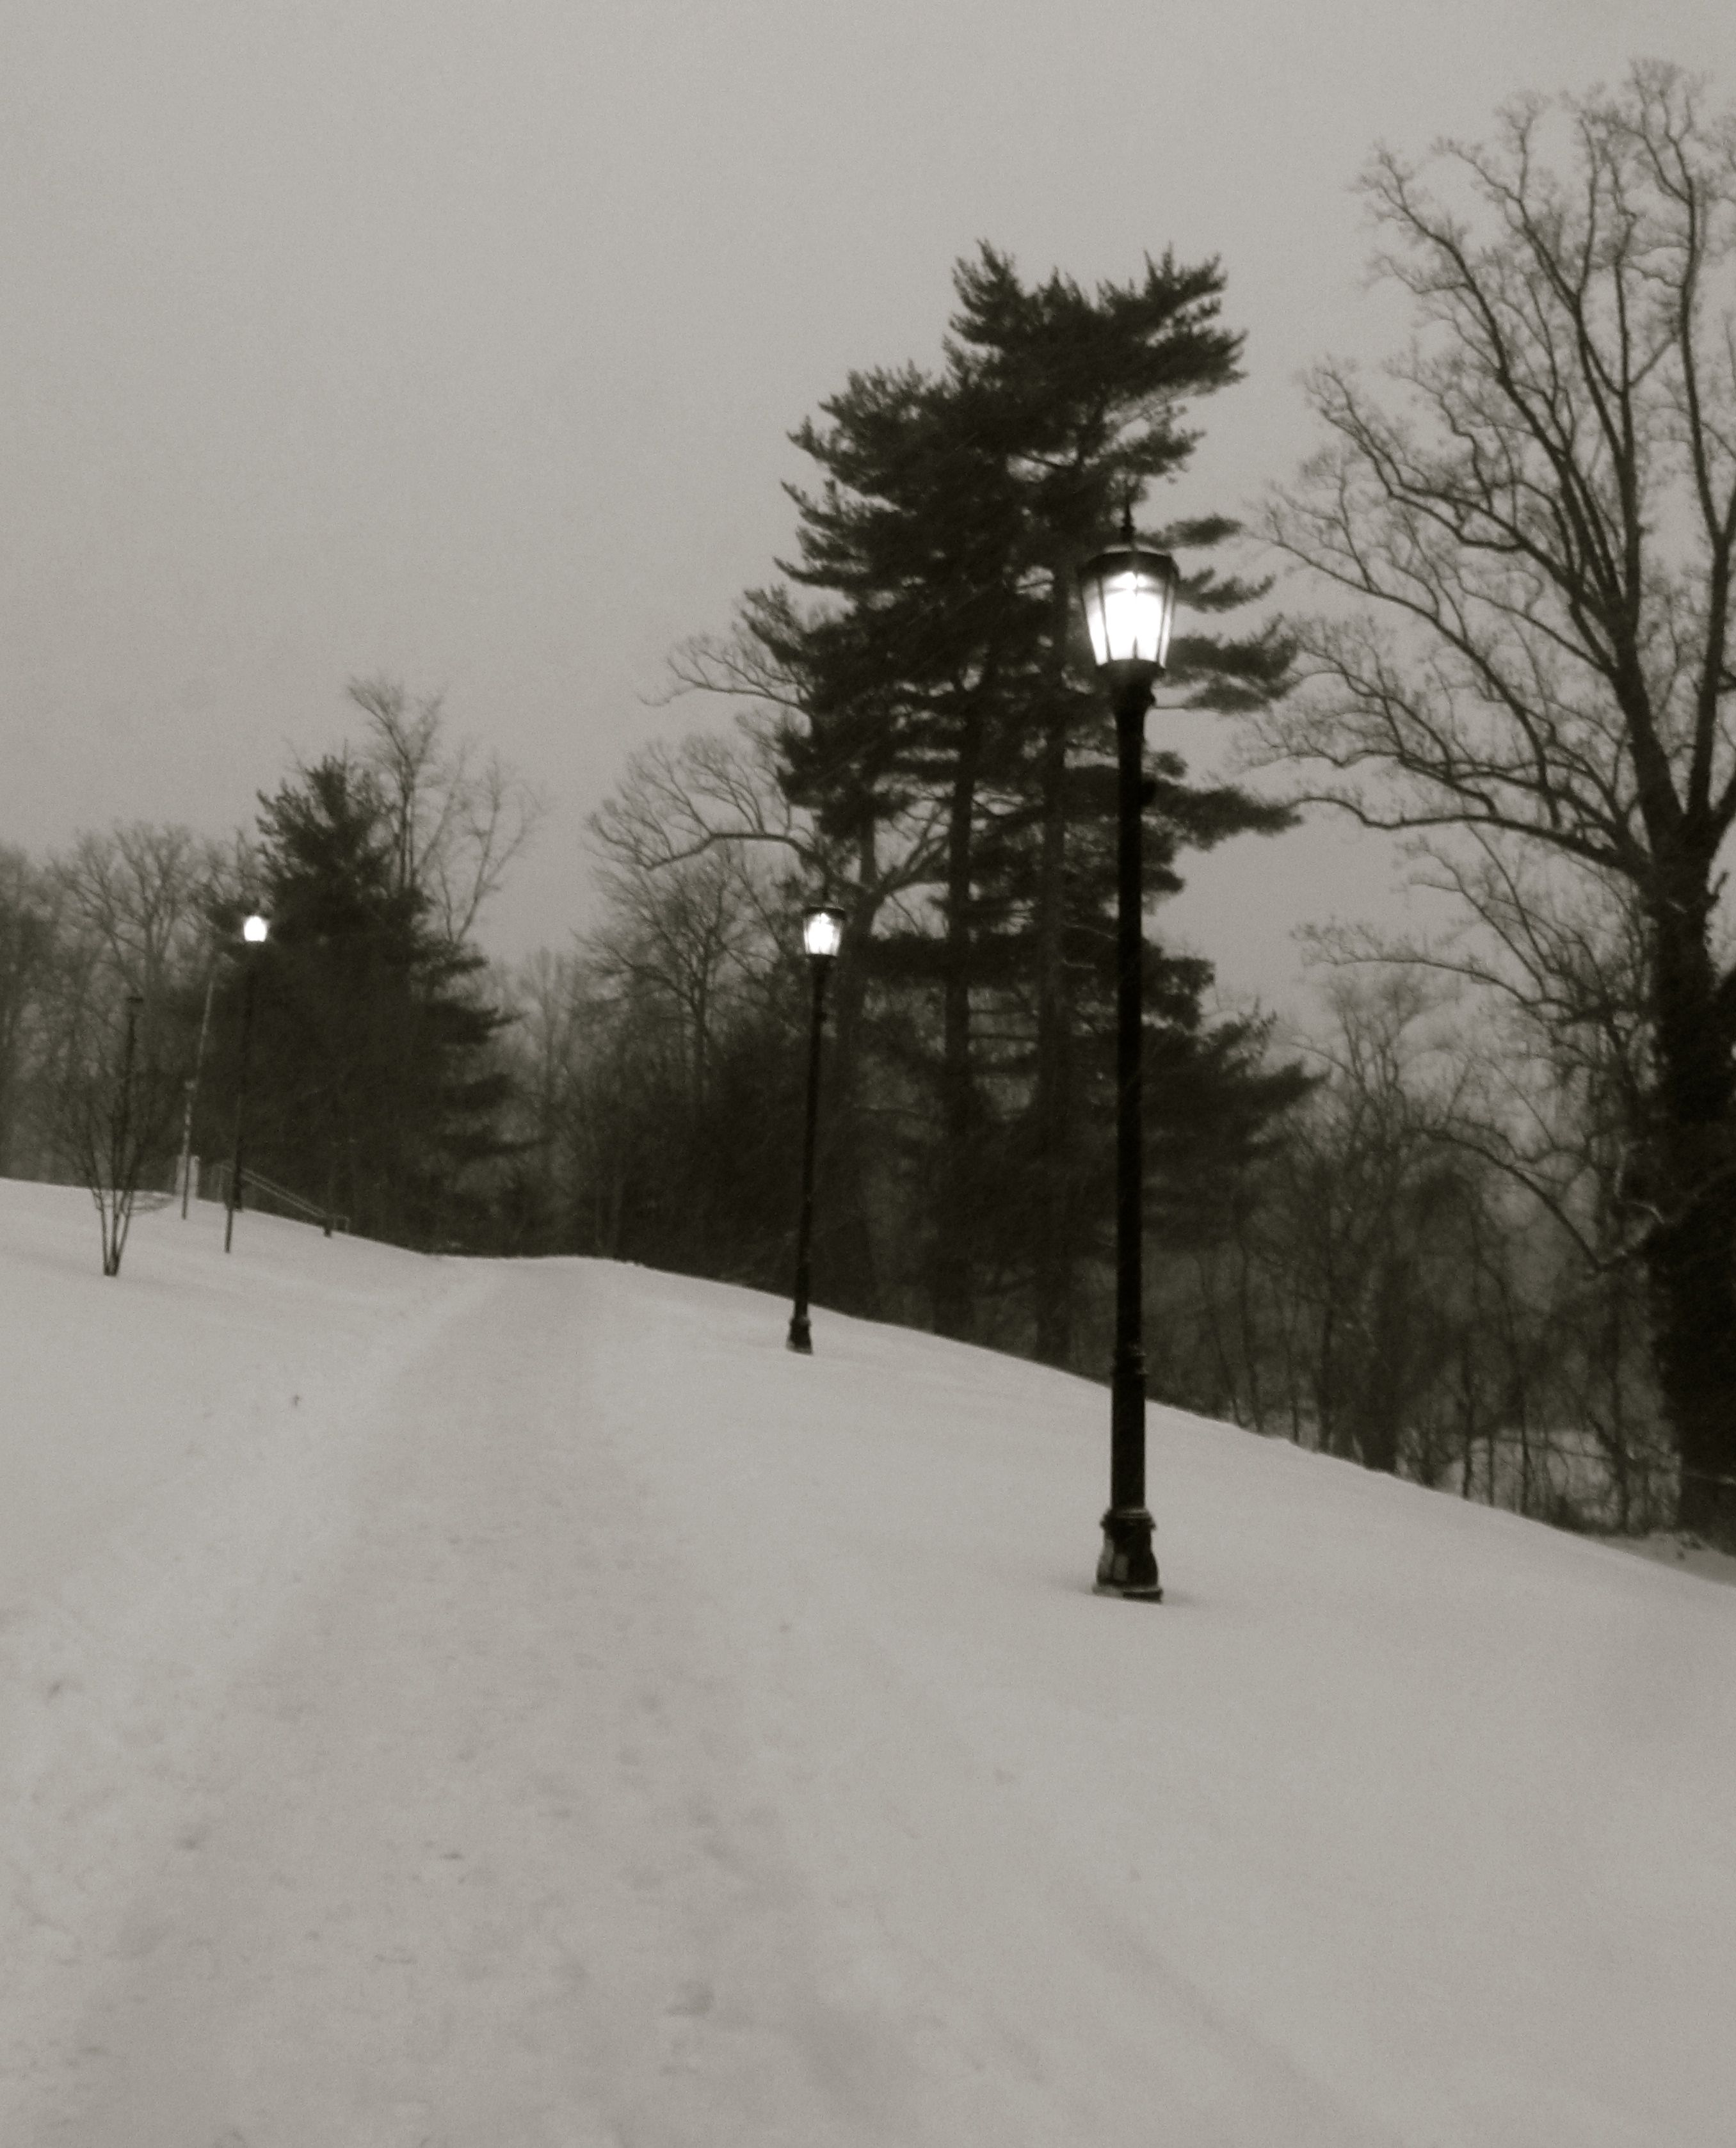 Winter at Loyola